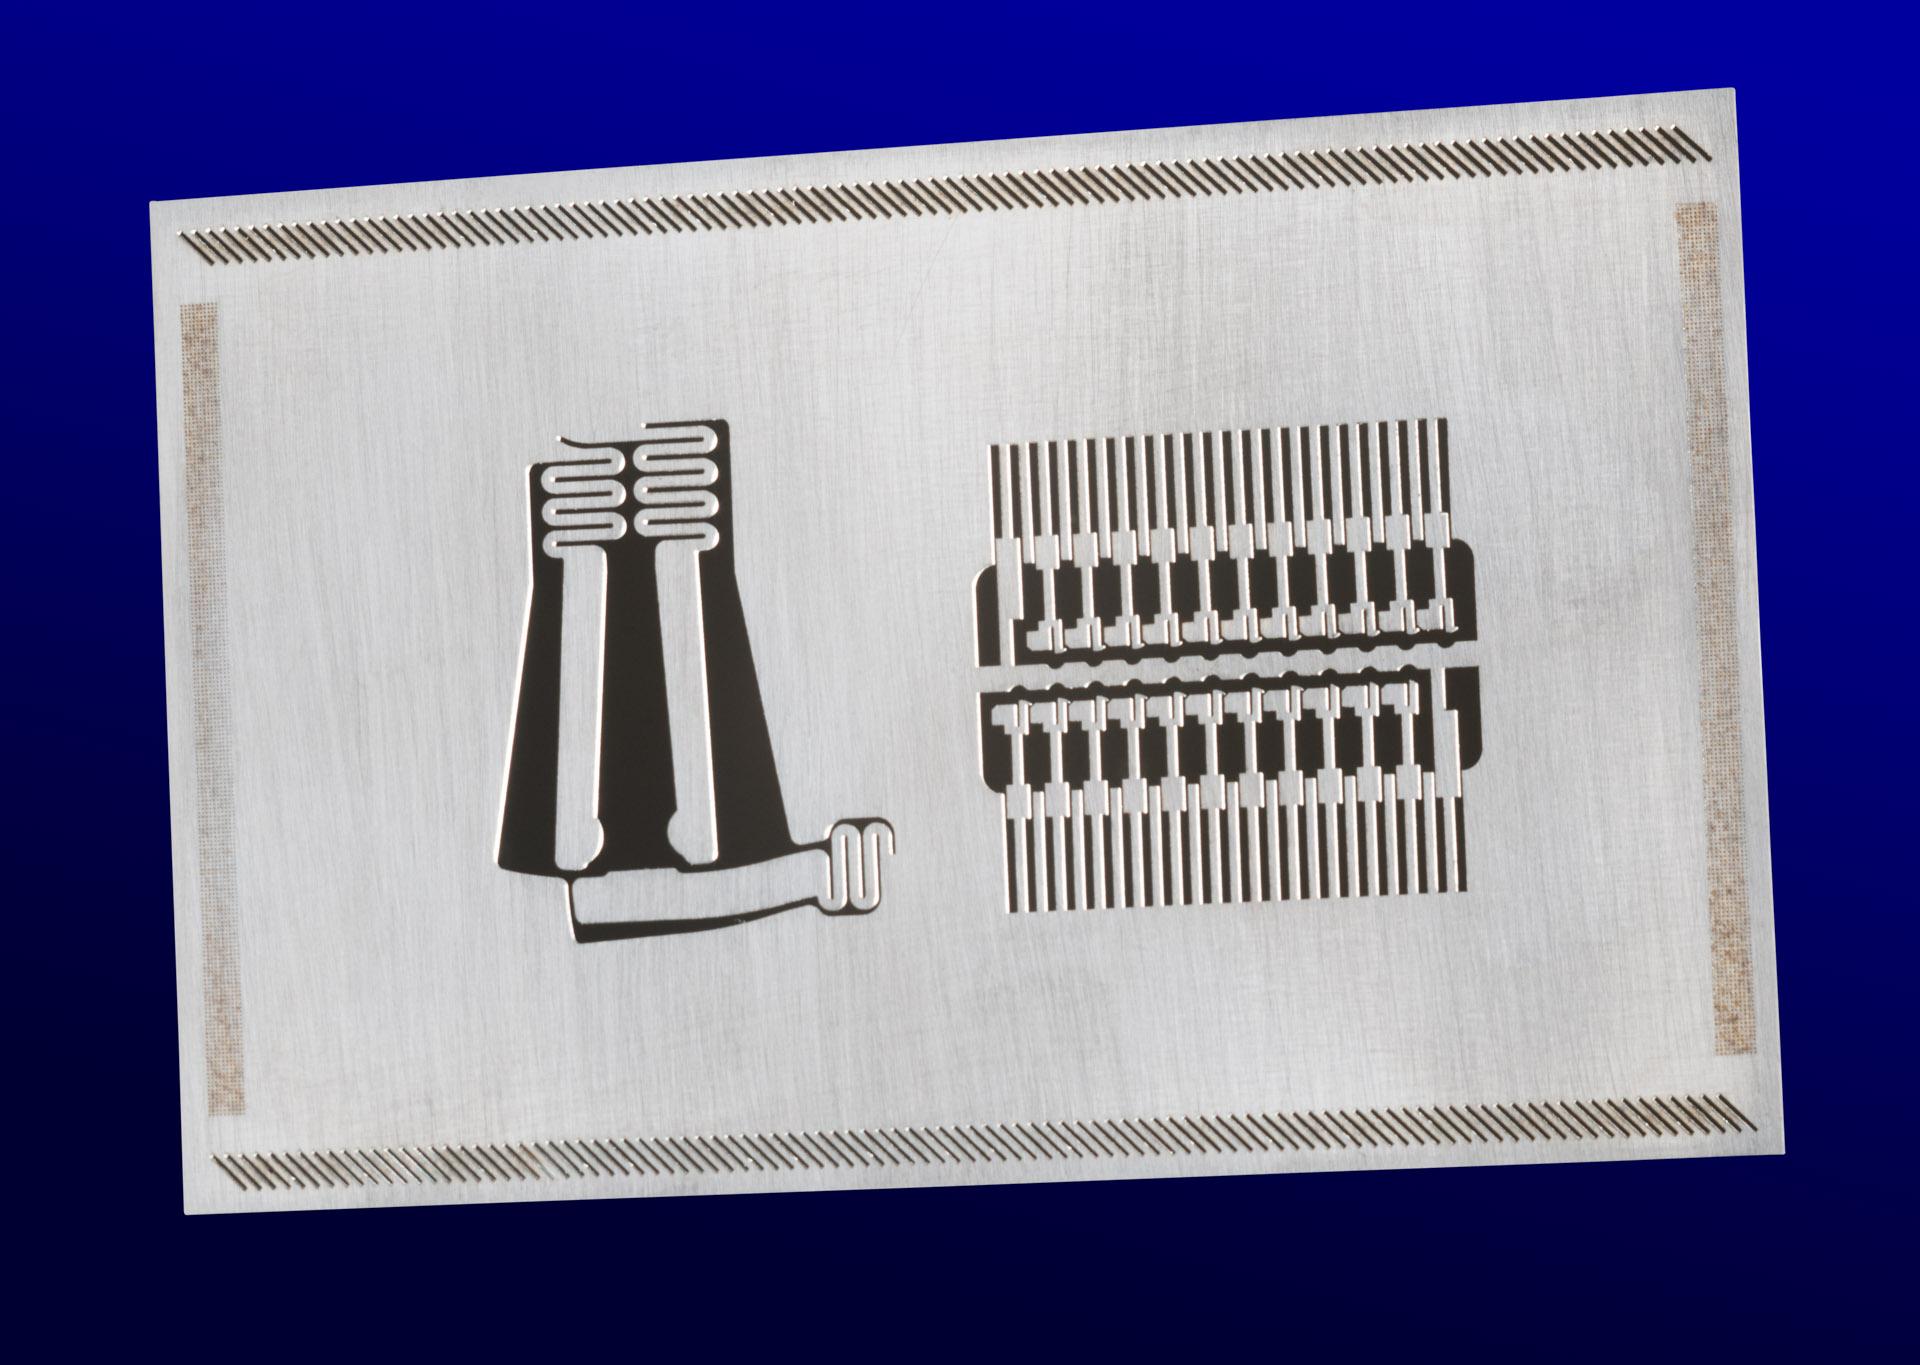 Laser cutting fabrication